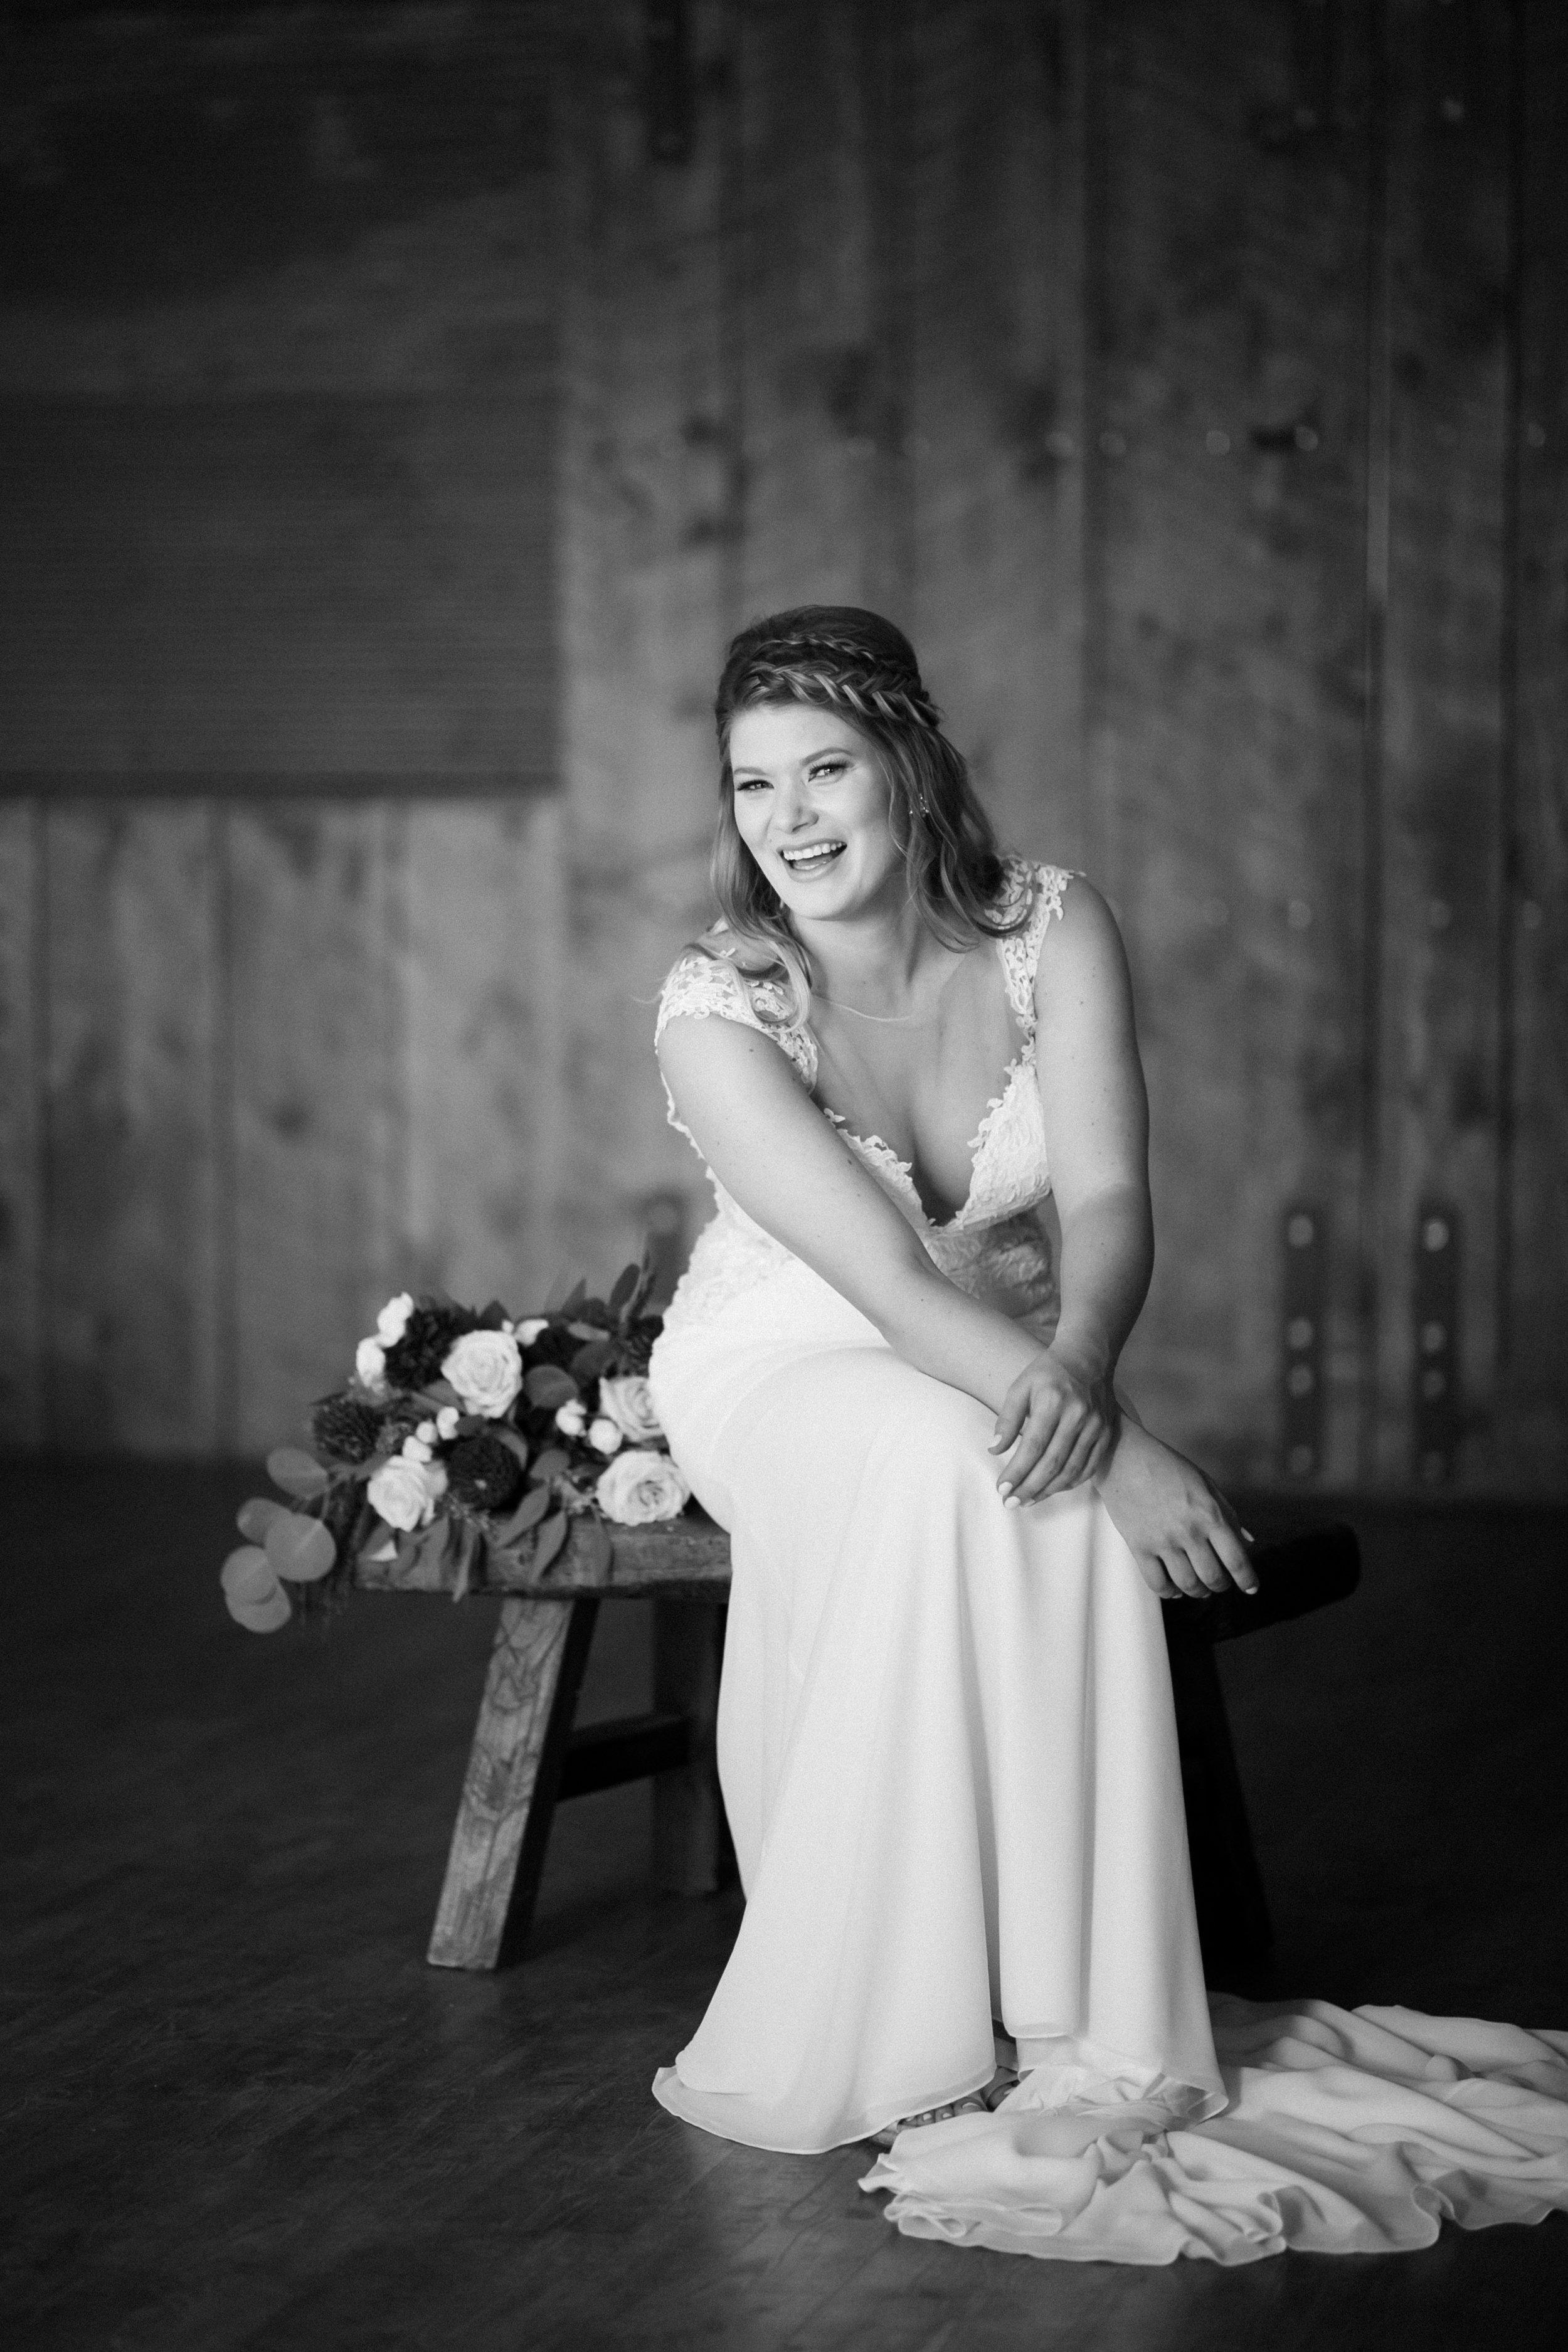 Wedding Preparation - Bridal Portrait